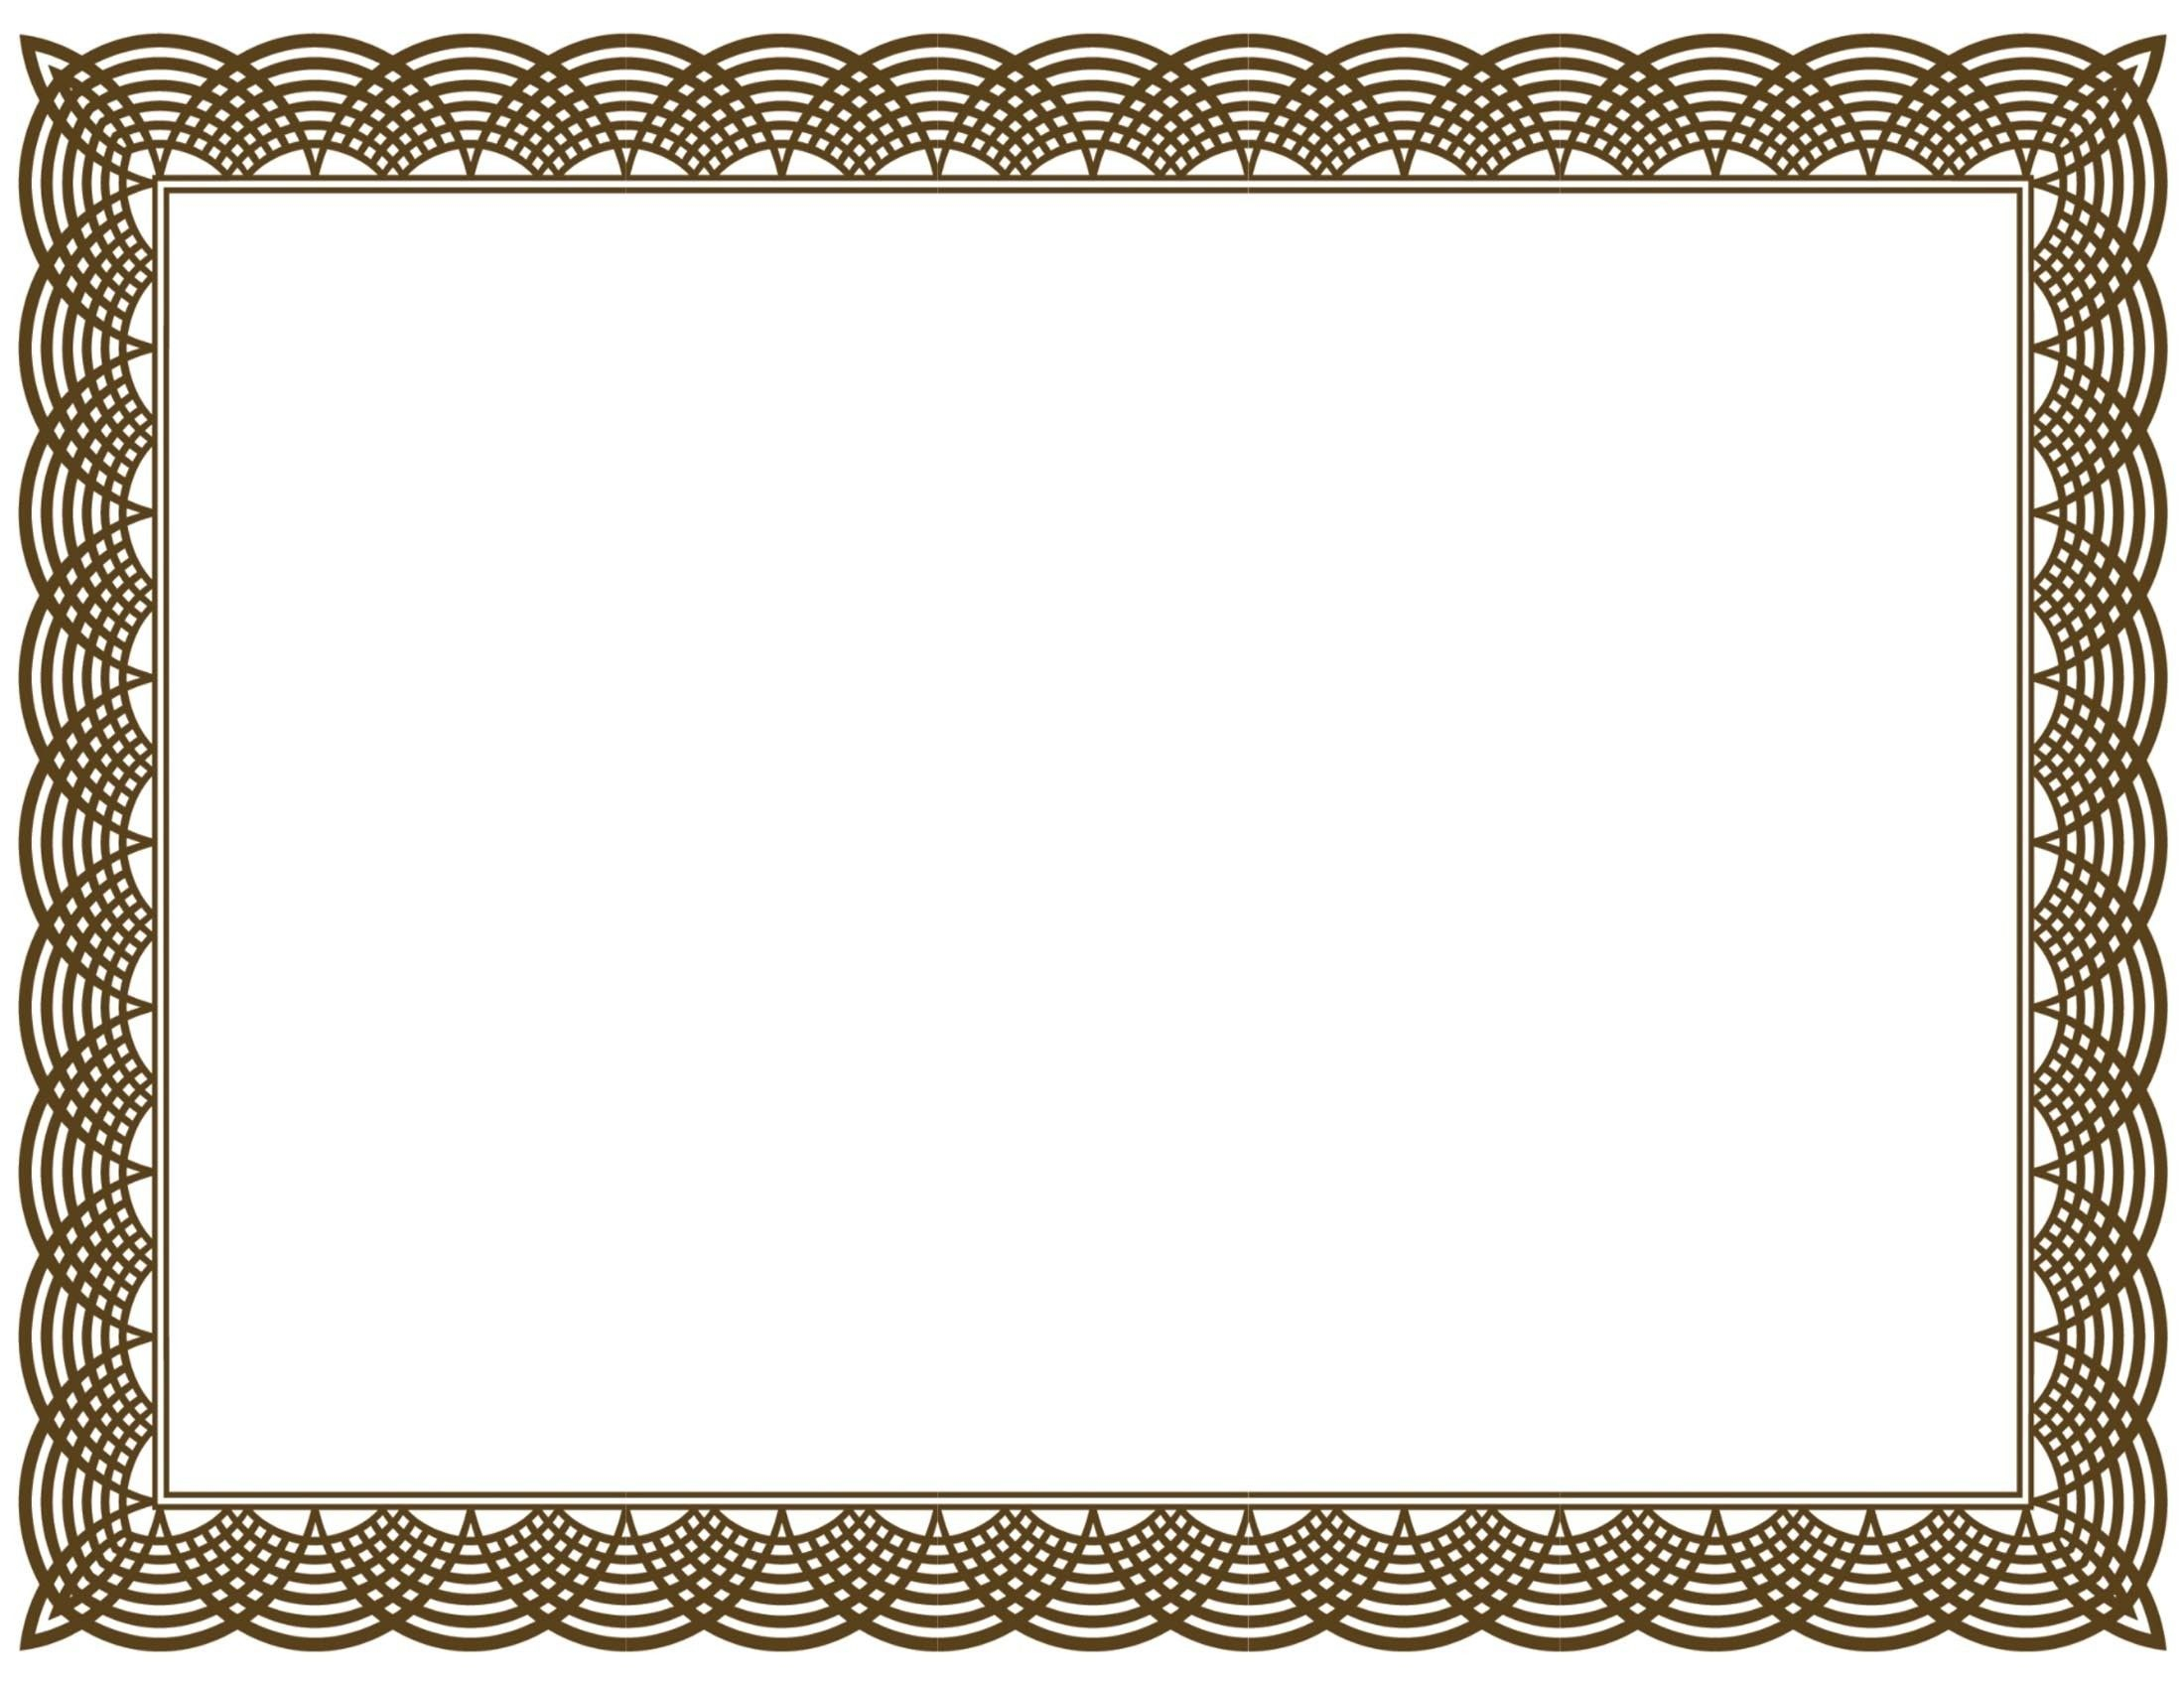 Award Certificate Border Pdf Template In Certificate Border Inside Award Certificate Border Template